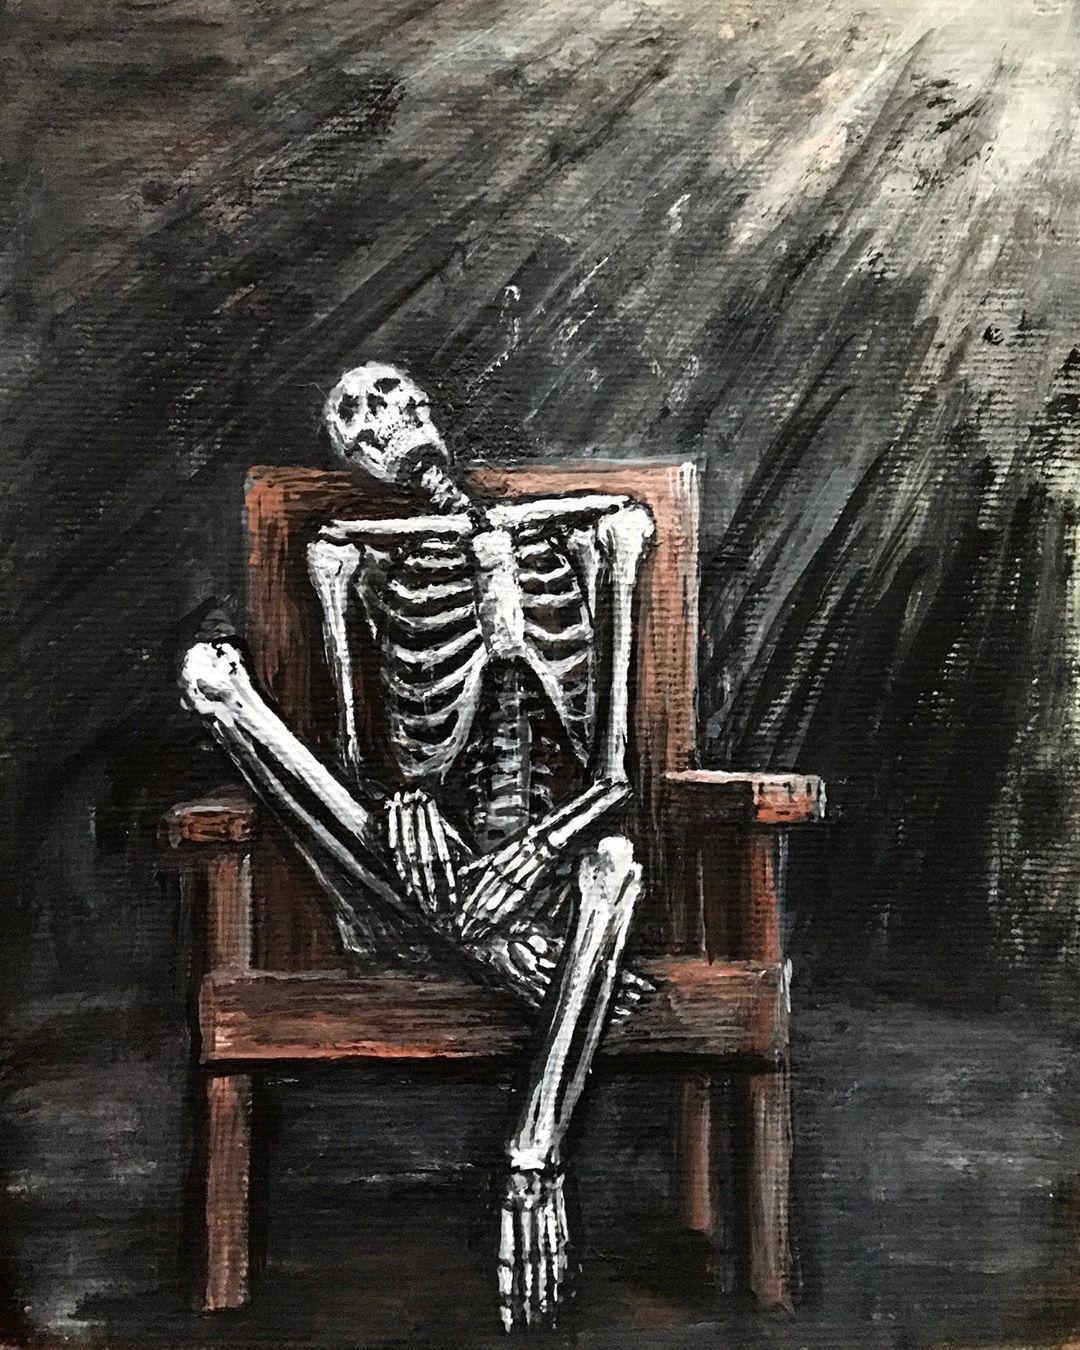 Saturdays are weird  (painting for sale @tinypieceofmercury ) #art #artwork #illustration #darkillustration #dark #darkart #darkarts #darkartists #darksurrealism #gouache #gouachepainting #painting #lowbrow #lowbrowart #skeleton #macabre #macabreart #calaveras #outsiderart #artbrut